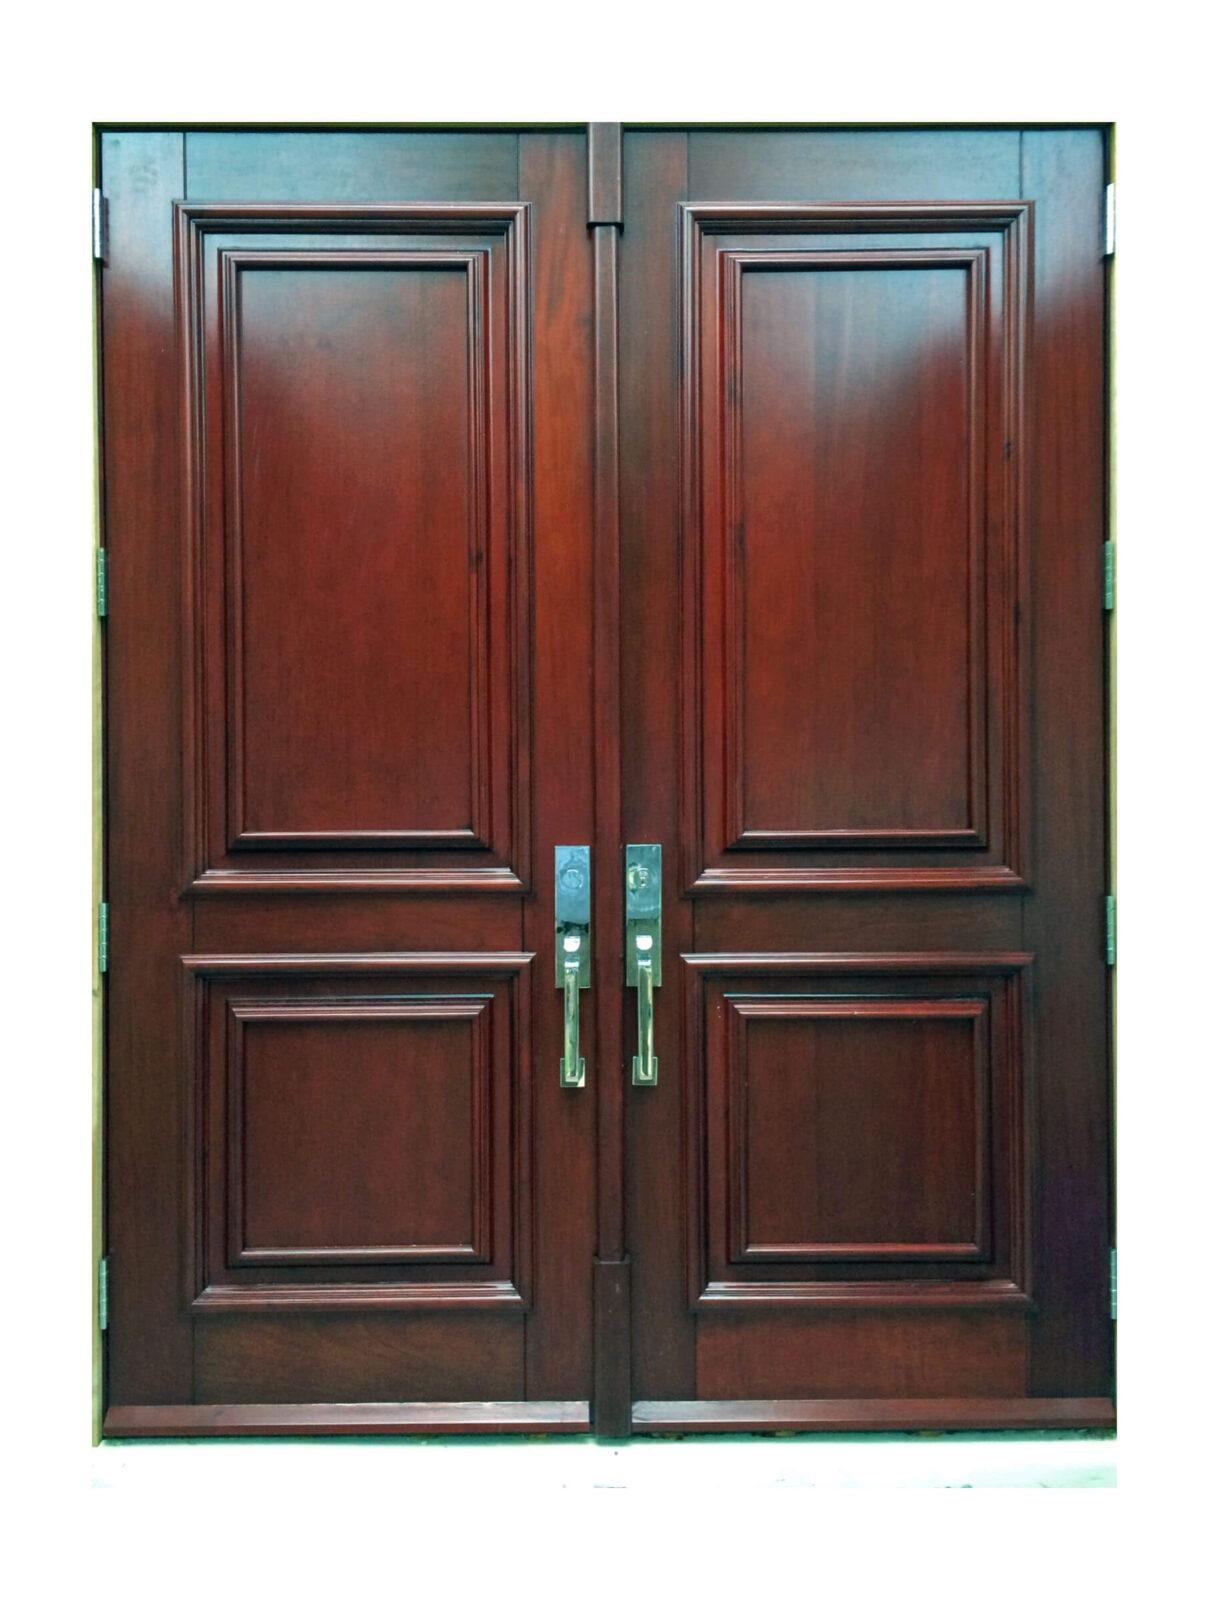 Nurmi Island Mahogany Doors